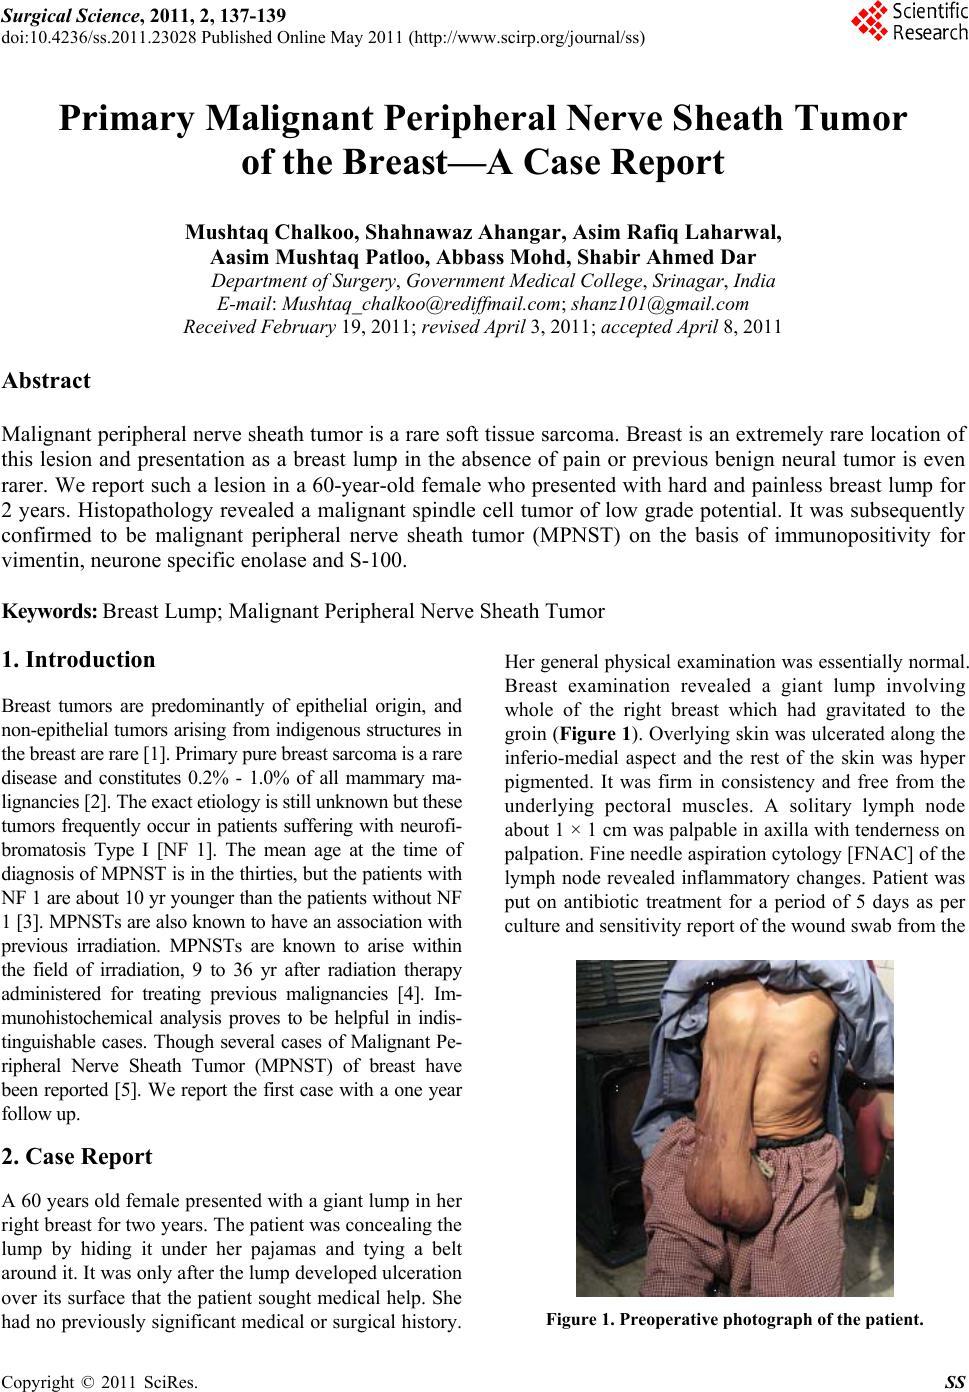 Primary Malignant Peripheral Nerve Sheath Tumor Of The border=